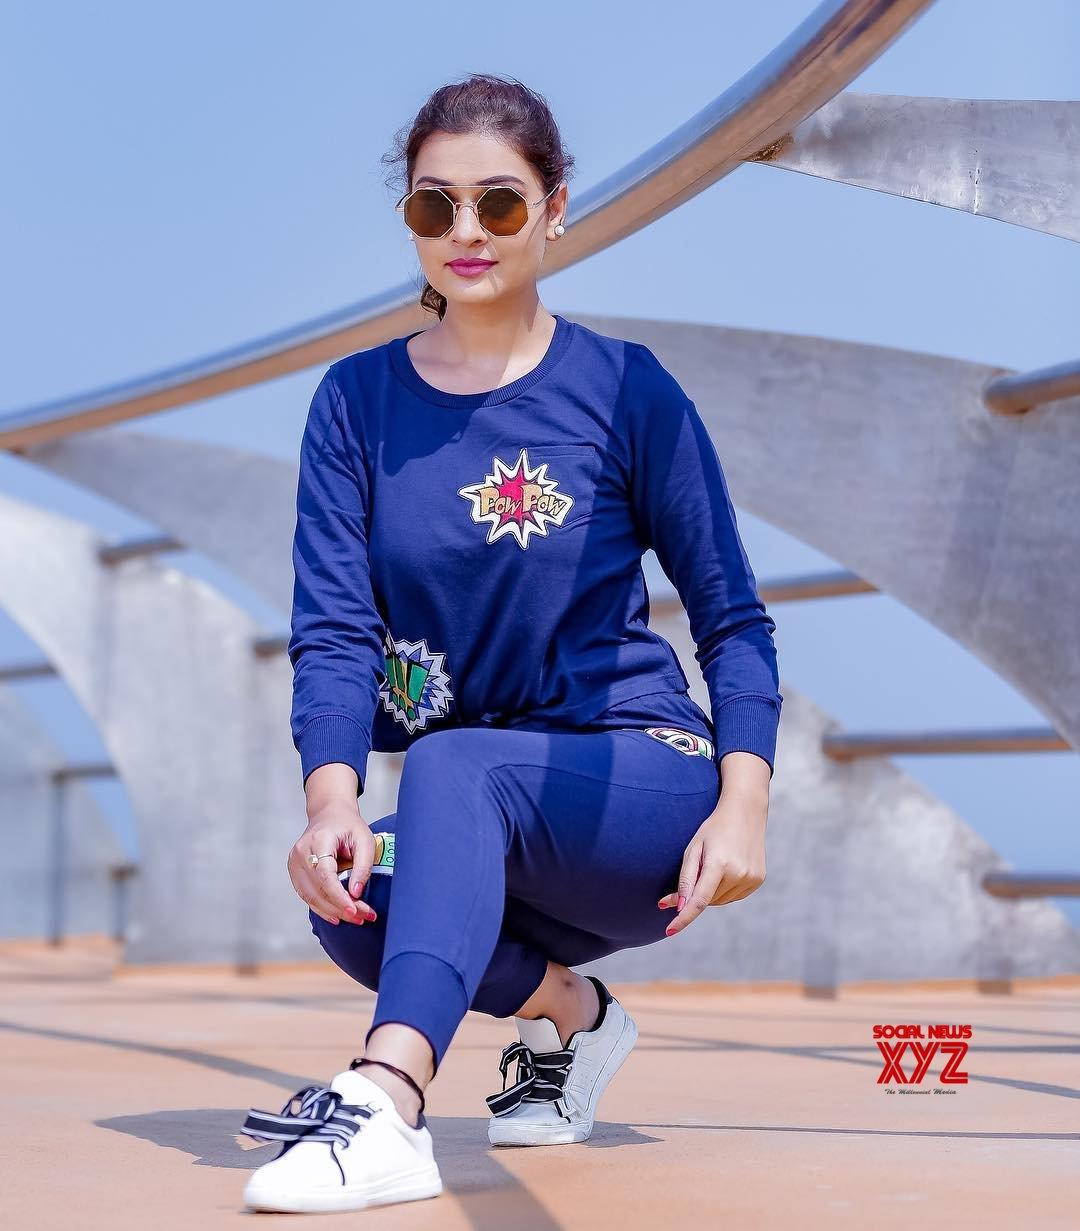 Actress Payal Rajput Stills In Missa More Clothing